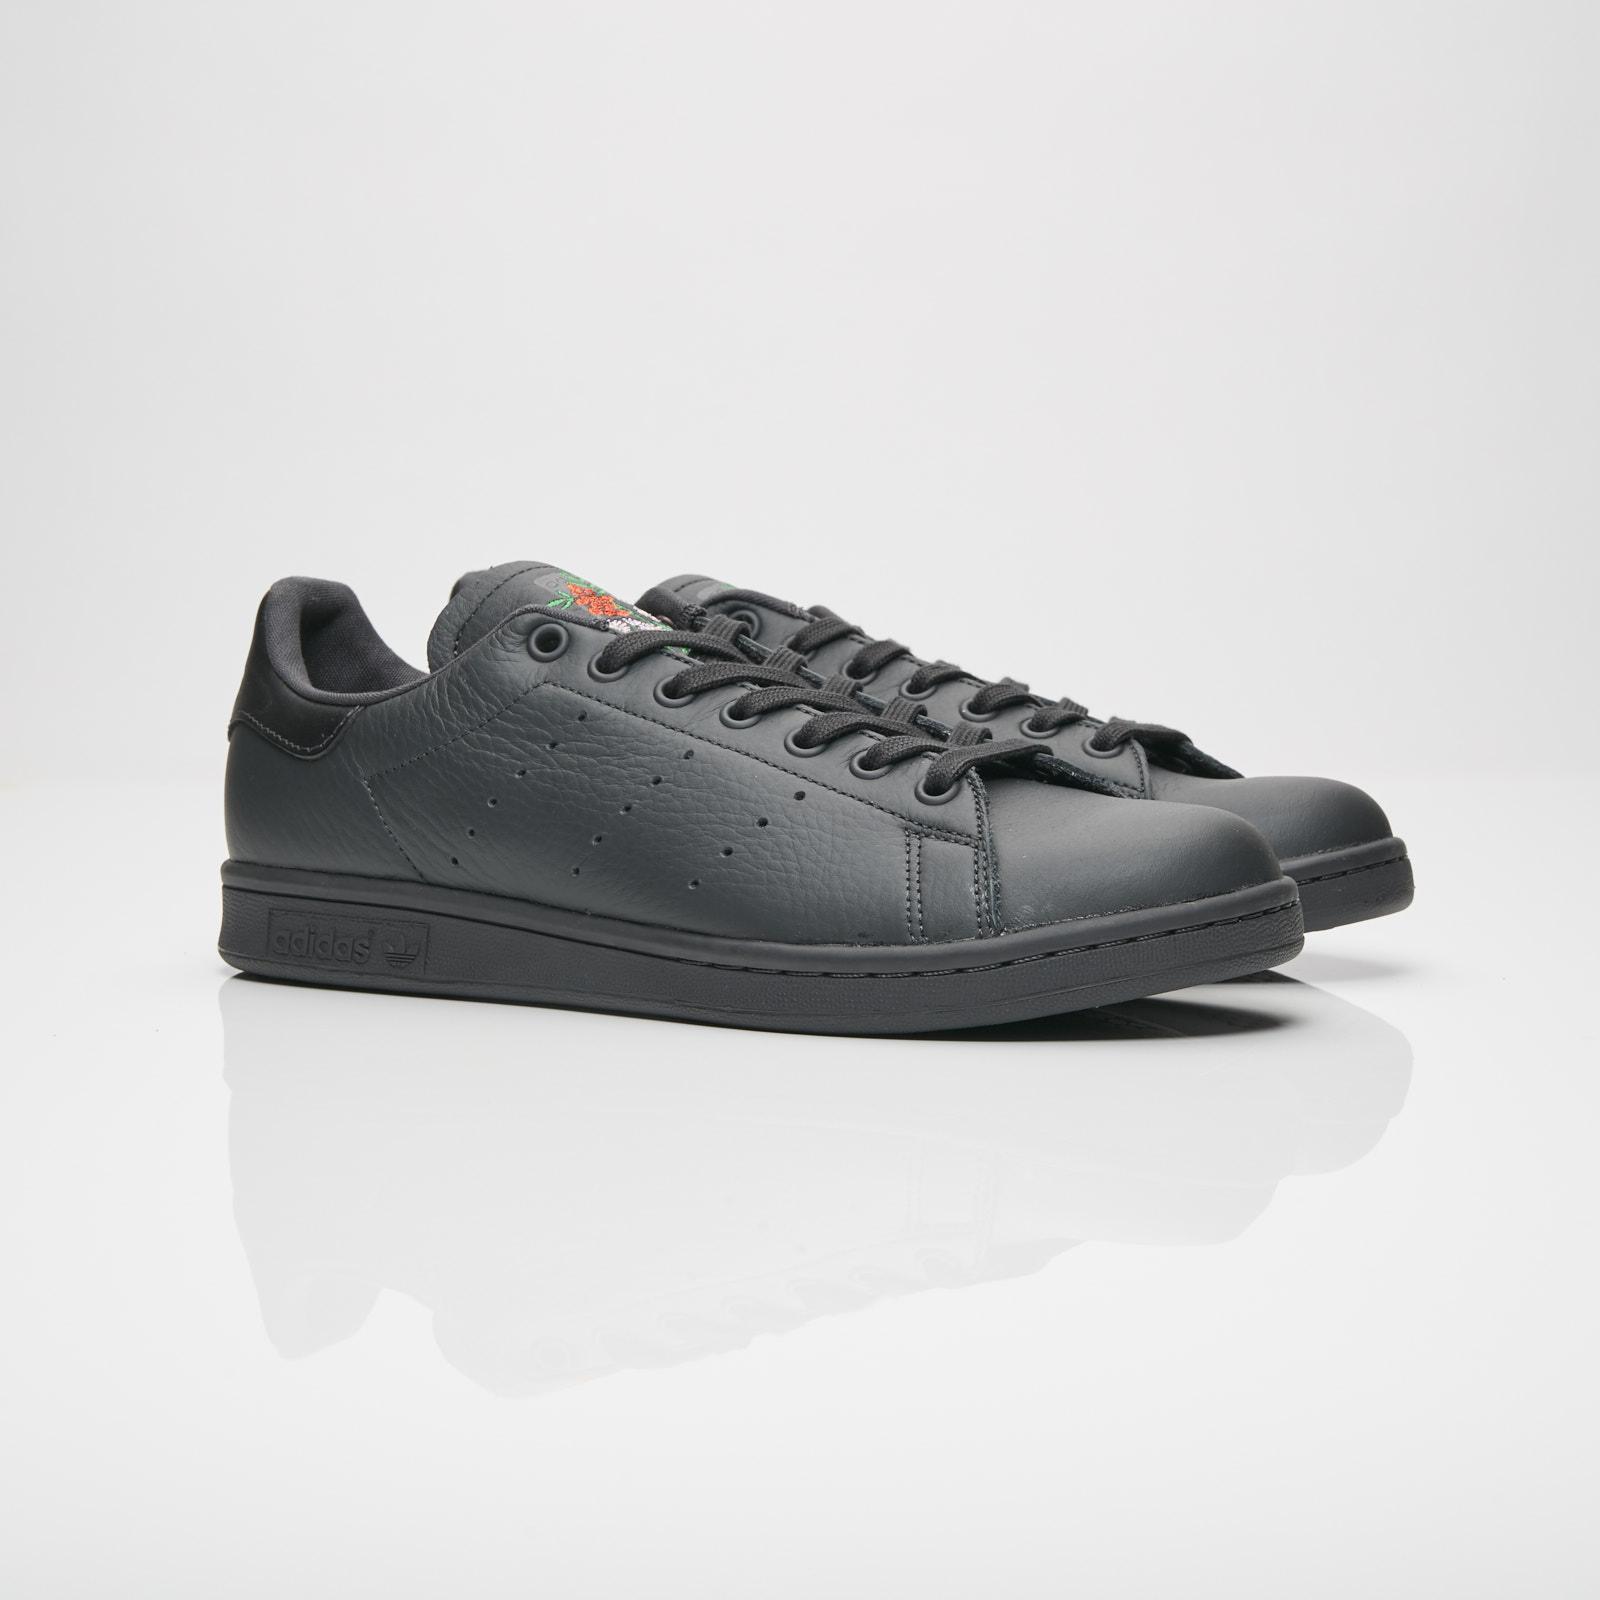 hot sale online 63103 1ecf6 adidas Stan Smith - Cq2197 - Sneakersnstuff   sneakers ...